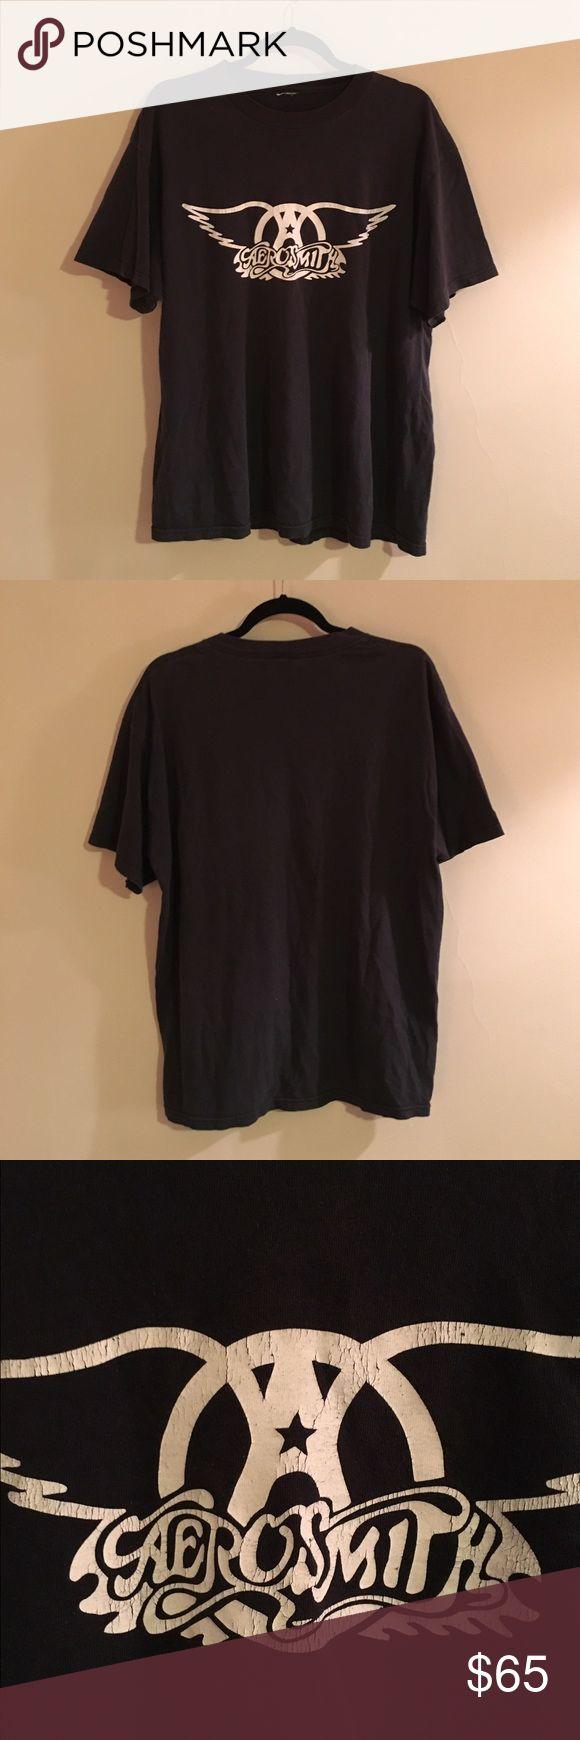 Vintage 80s Aerosmith Tour T-shirt Awesome vintage Aerosmith concert shirt. No longer has tag but fits like Men's Large Vintage Tops Tees - Short Sleeve